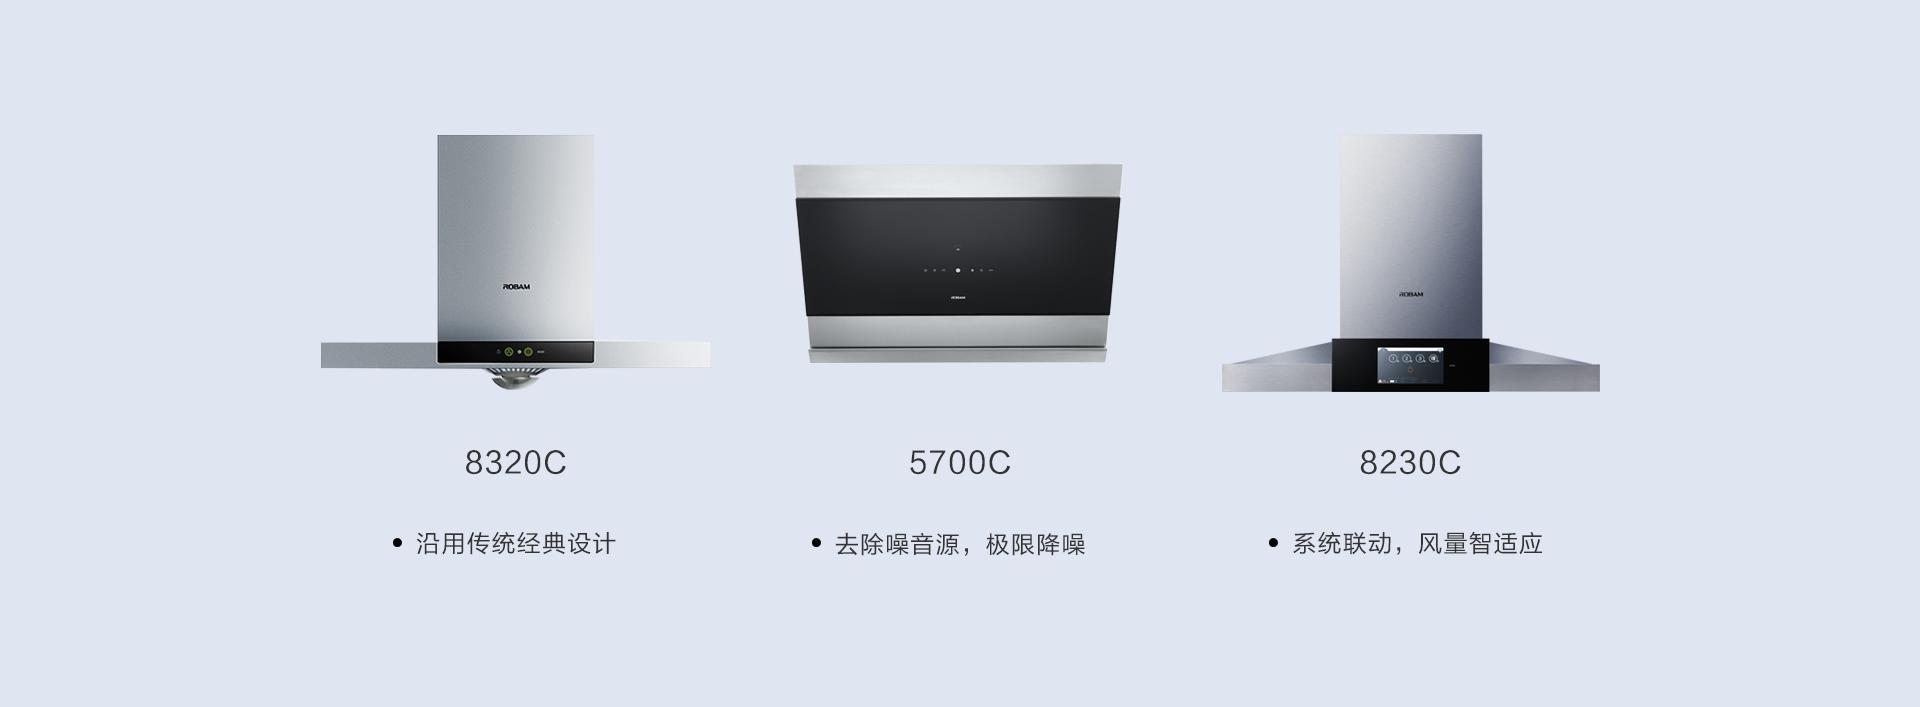 CCS-SLX-60B-详情页-PC端-201225_02.png